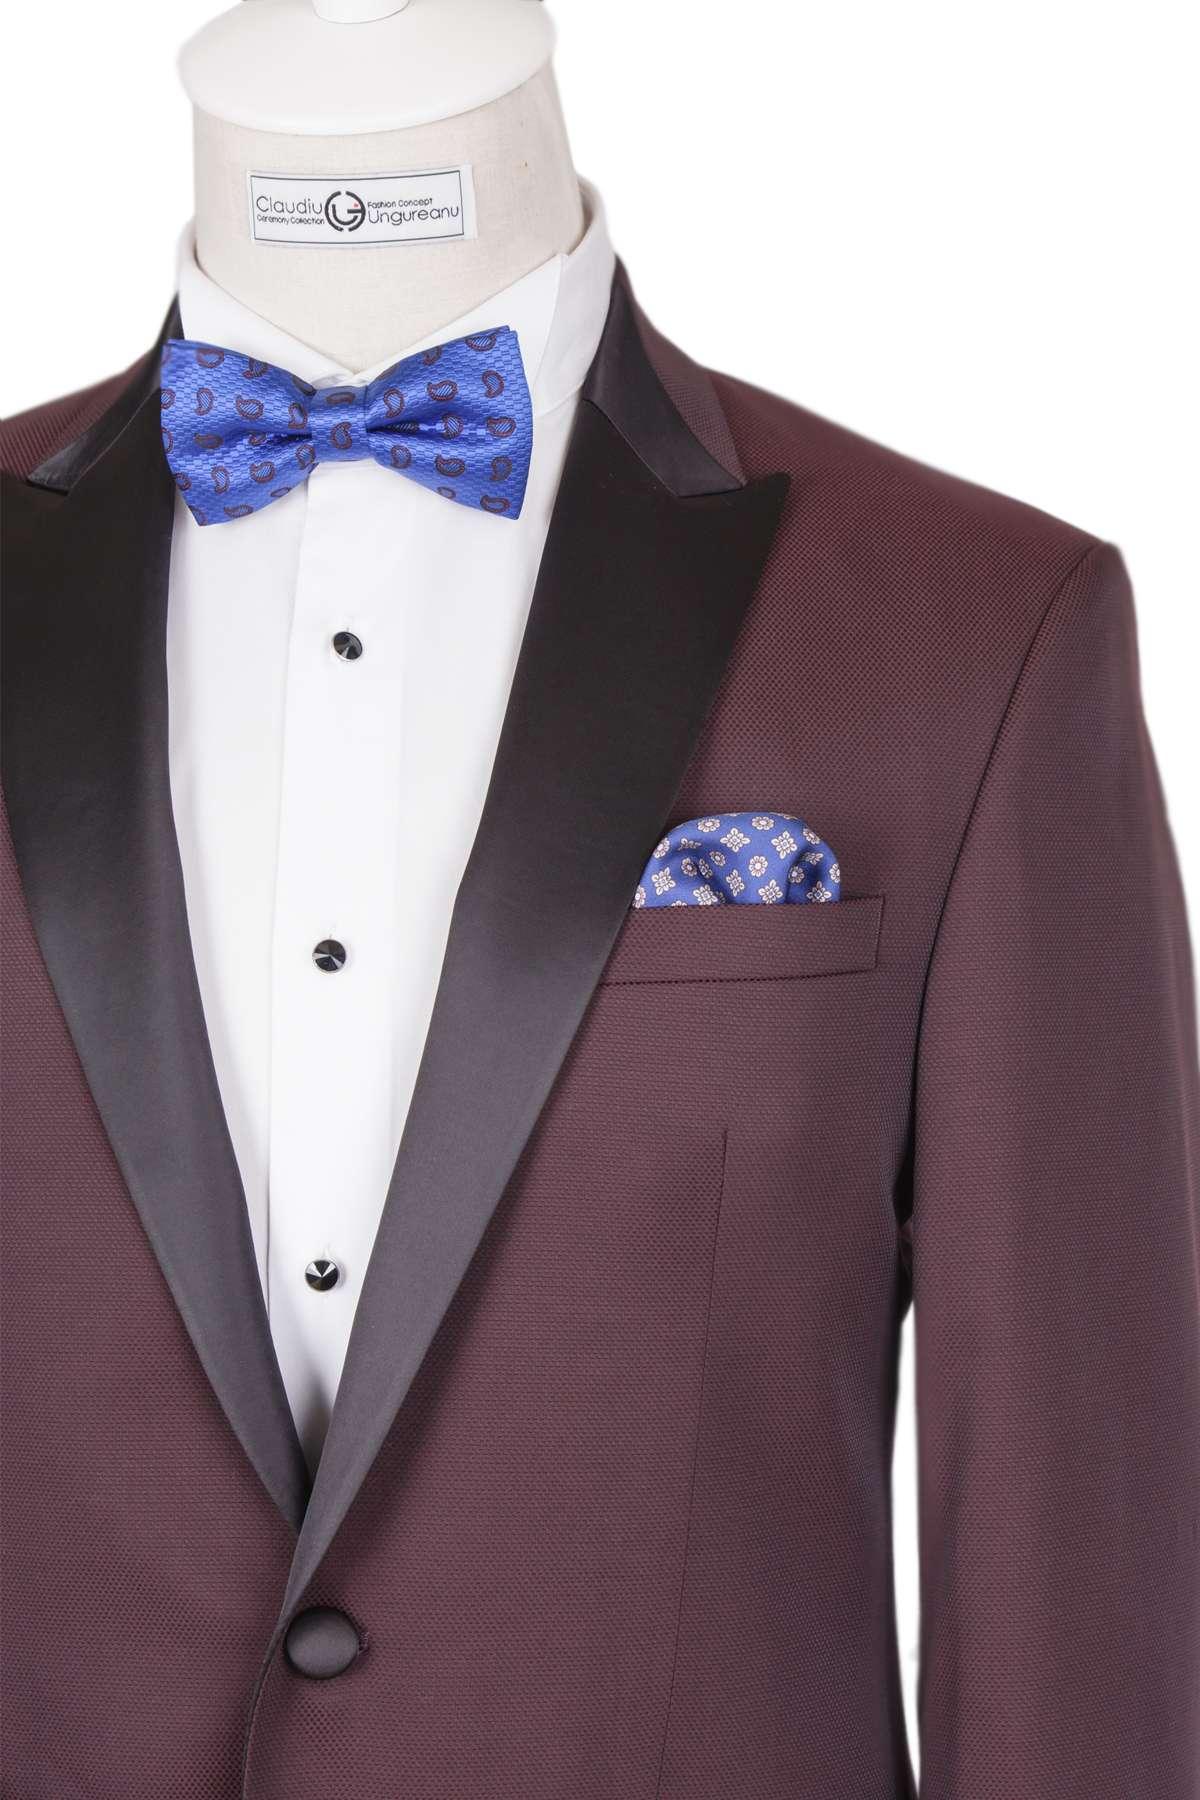 Bespoke Ceremony - Dark Burgundia Dinner Jacket